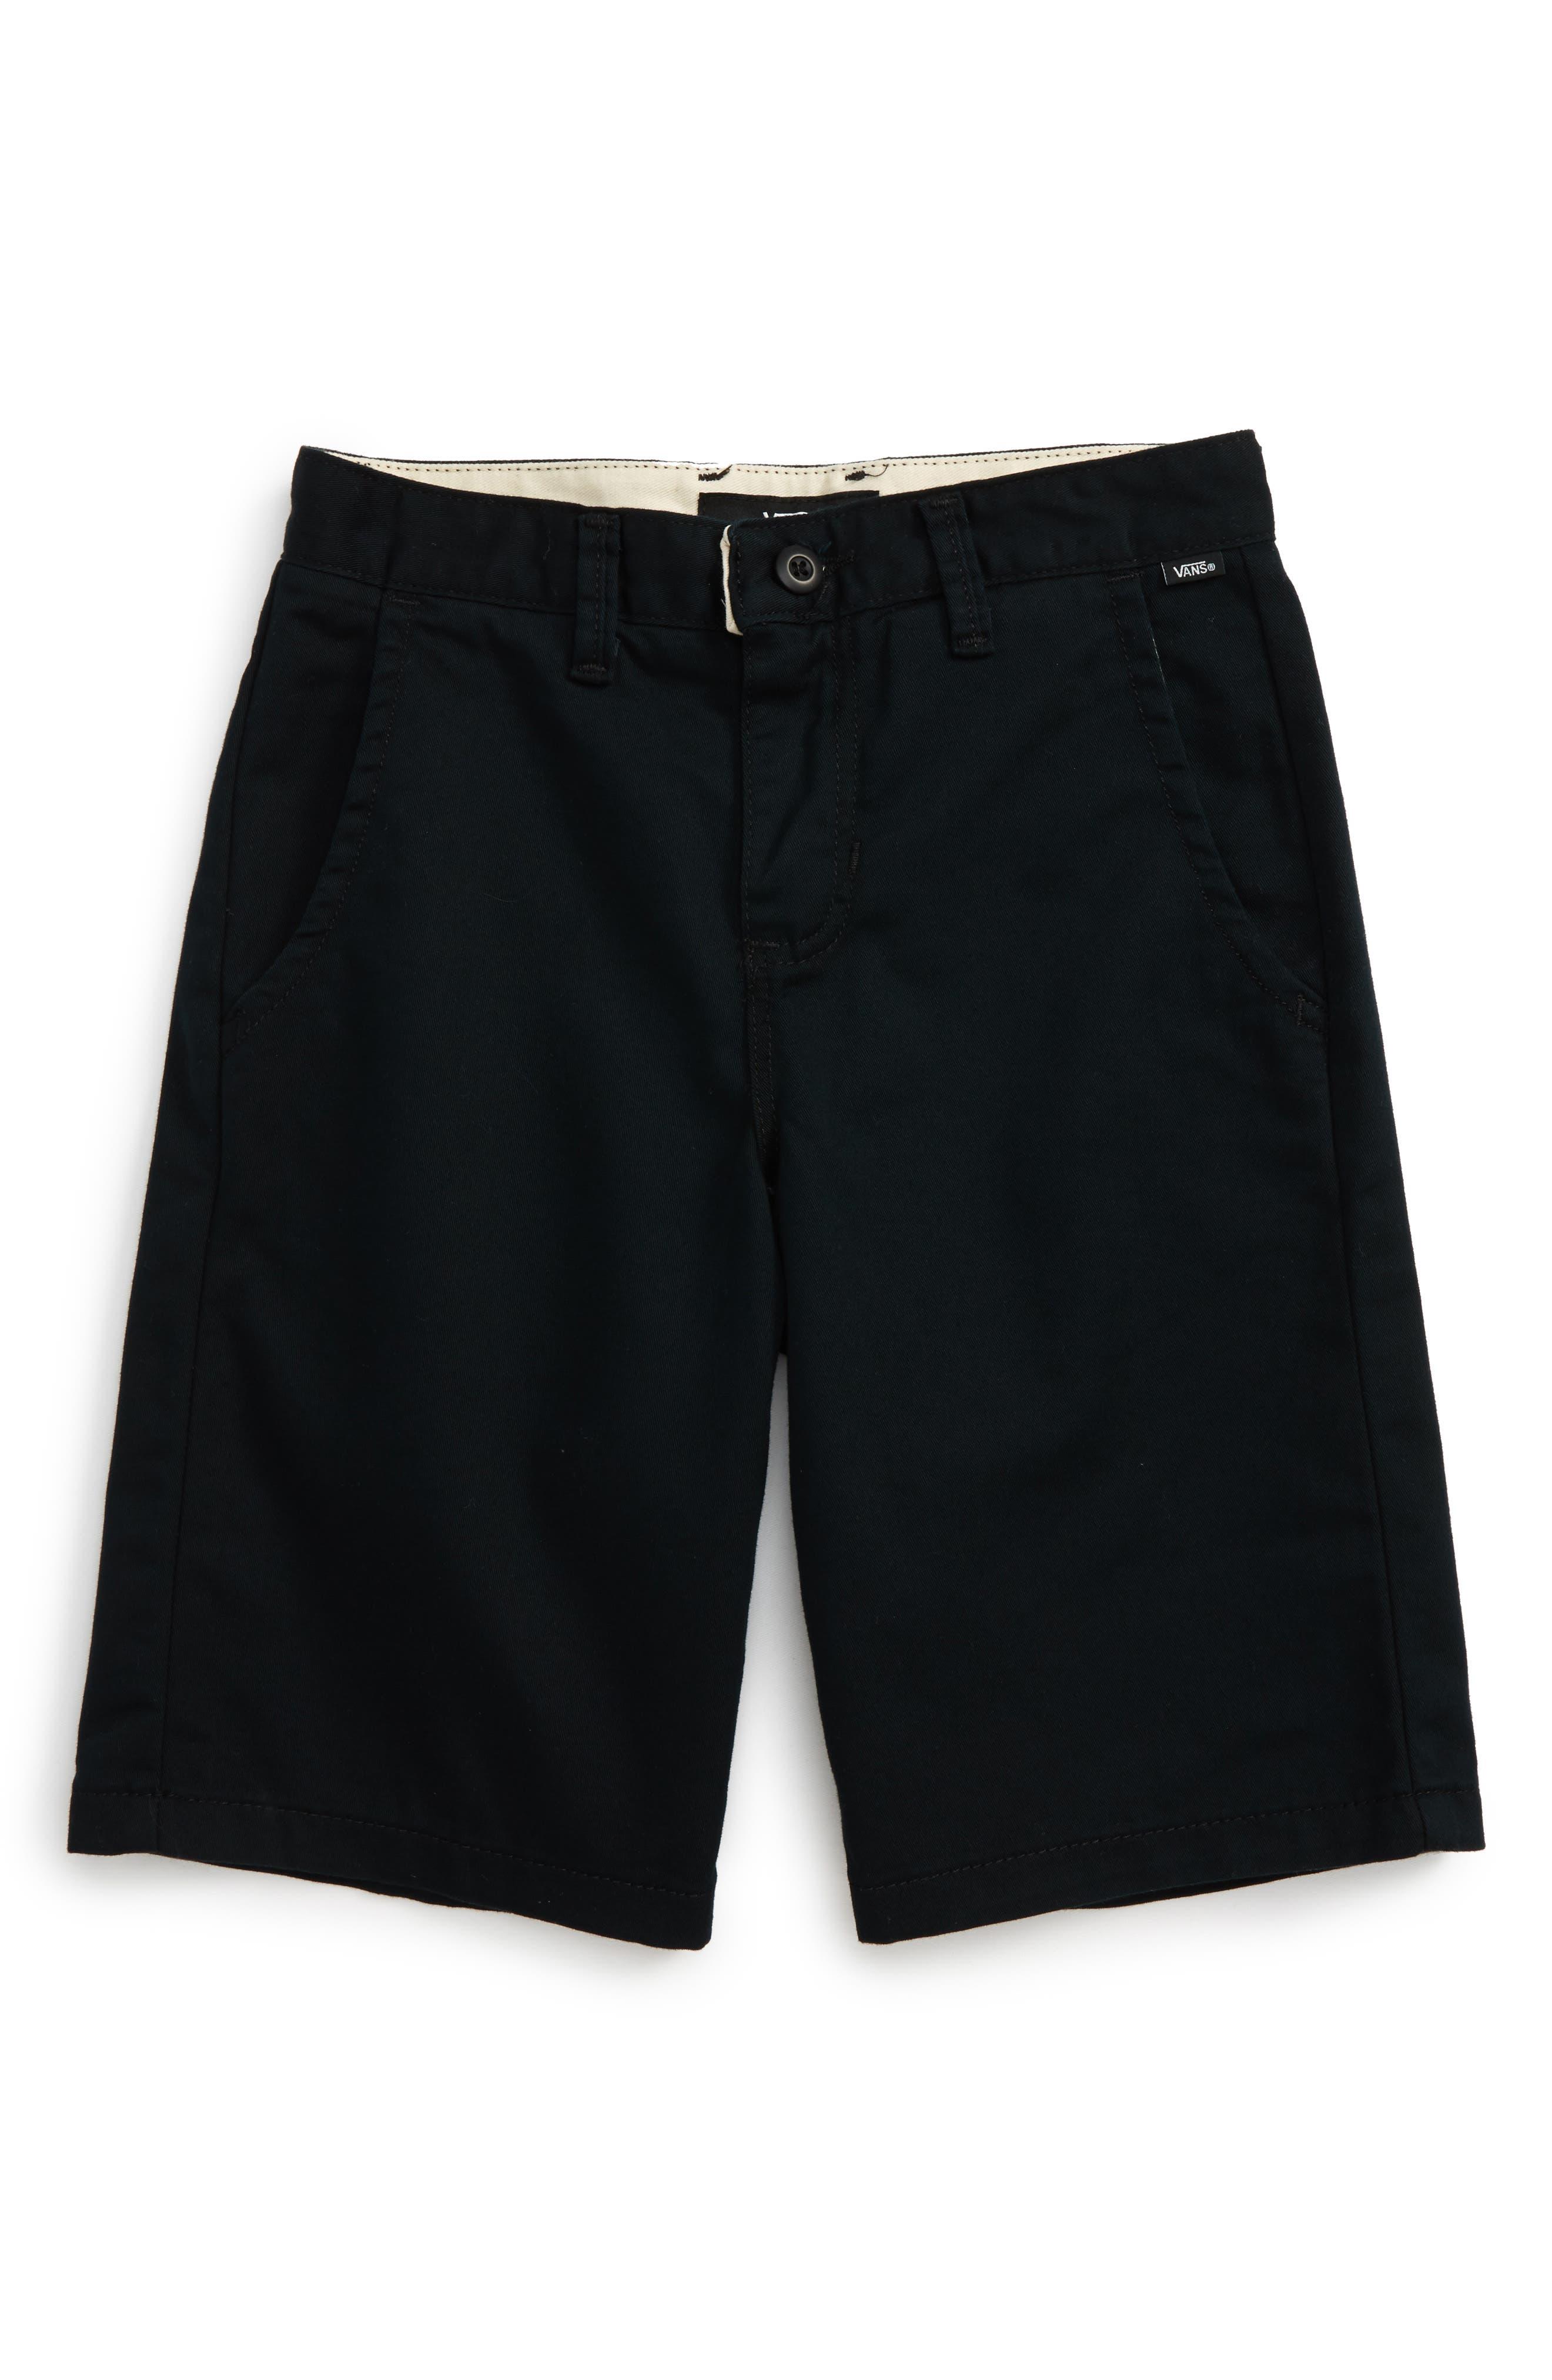 Alternate Image 1 Selected - Vans Authentic Walk Shorts (Big Boys)